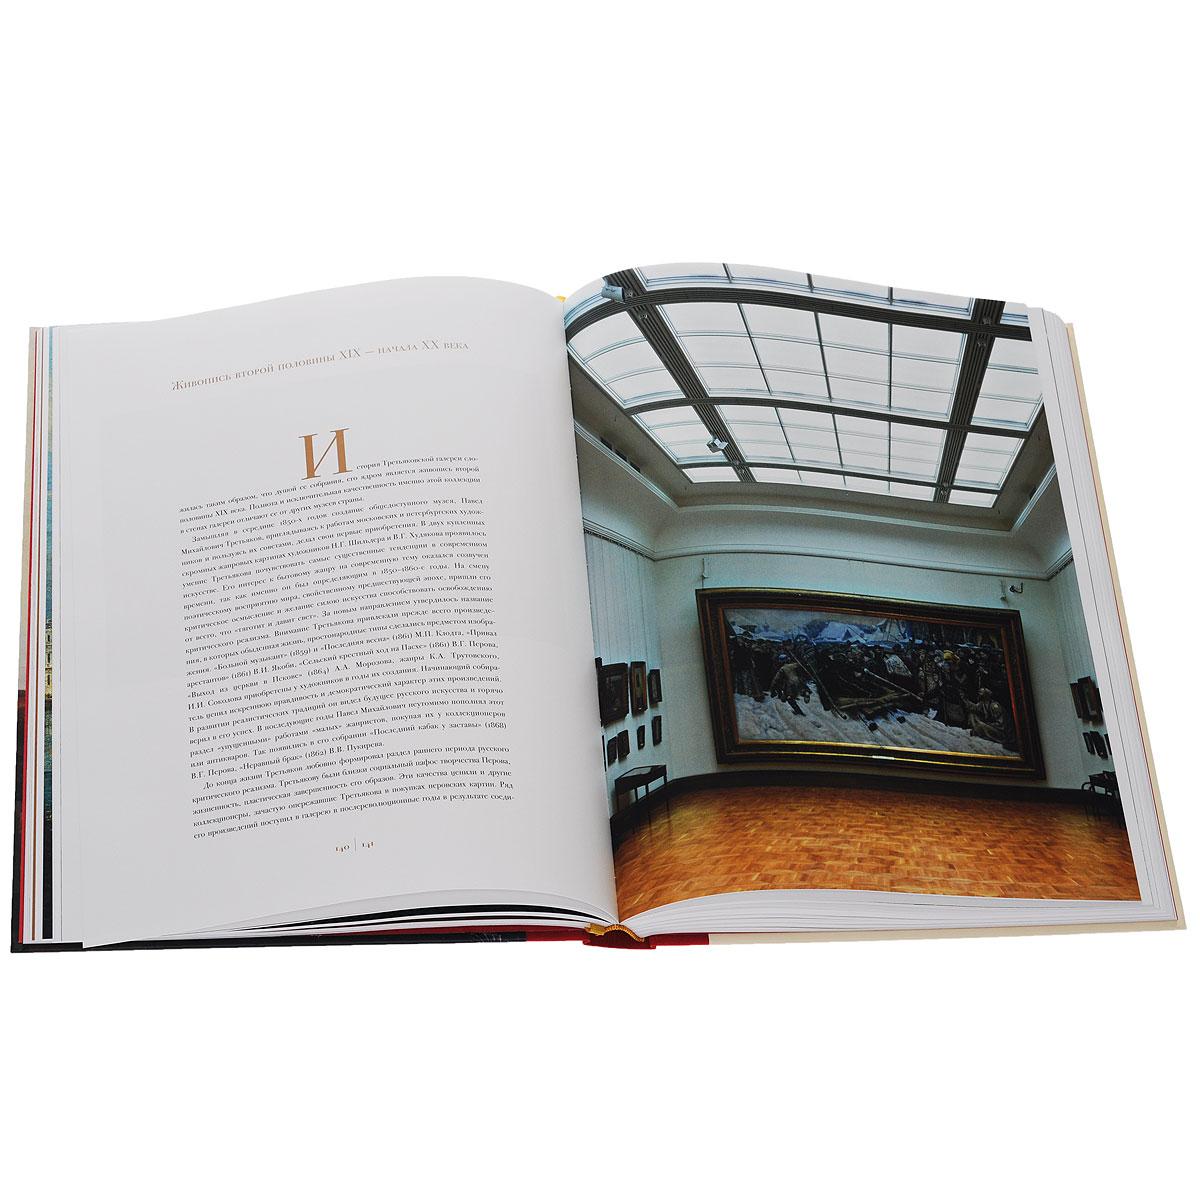 Государственная Третьяковская галерея. Искусство ХII - начала ХХ века. Альбом